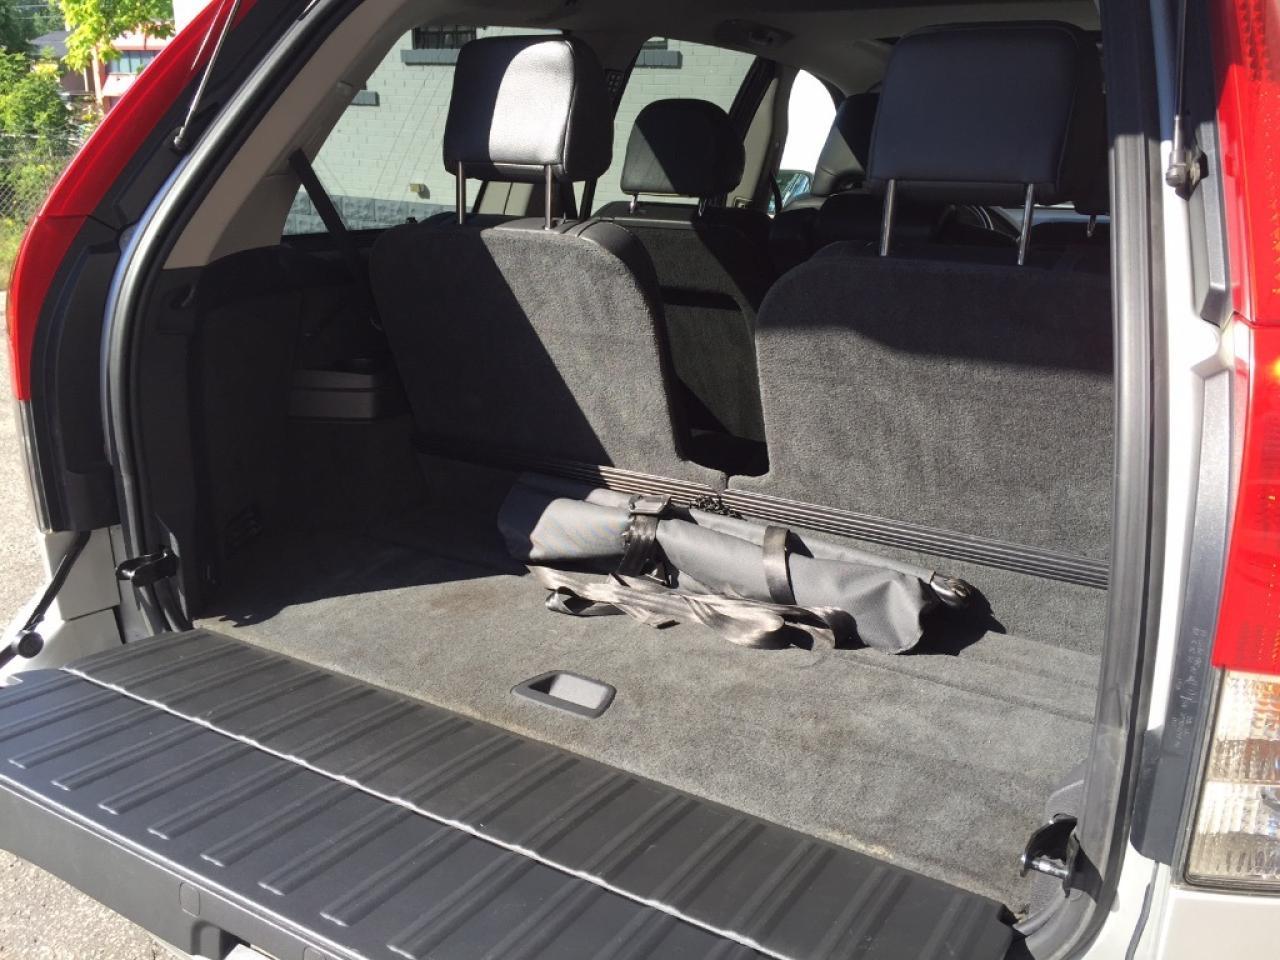 2008 Volvo XC90 3.2 AWD SR, 7 Passenger